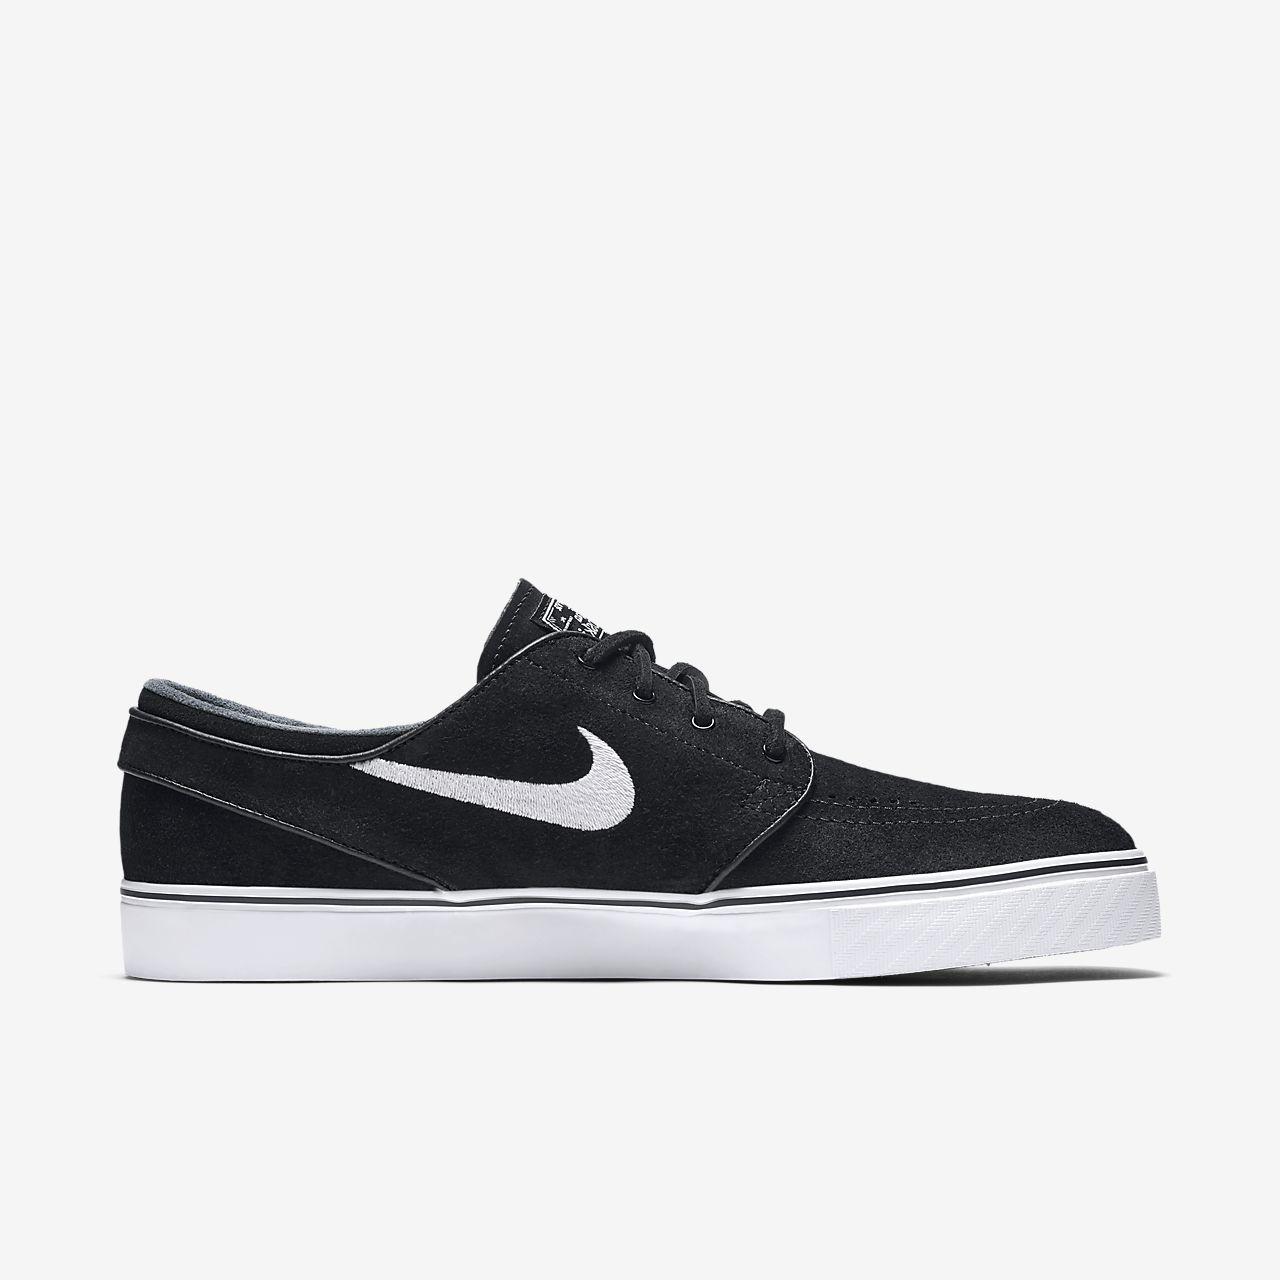 913727f9369 Chaussure de skateboard Nike SB Zoom Stefan Janoski OG pour Homme ...